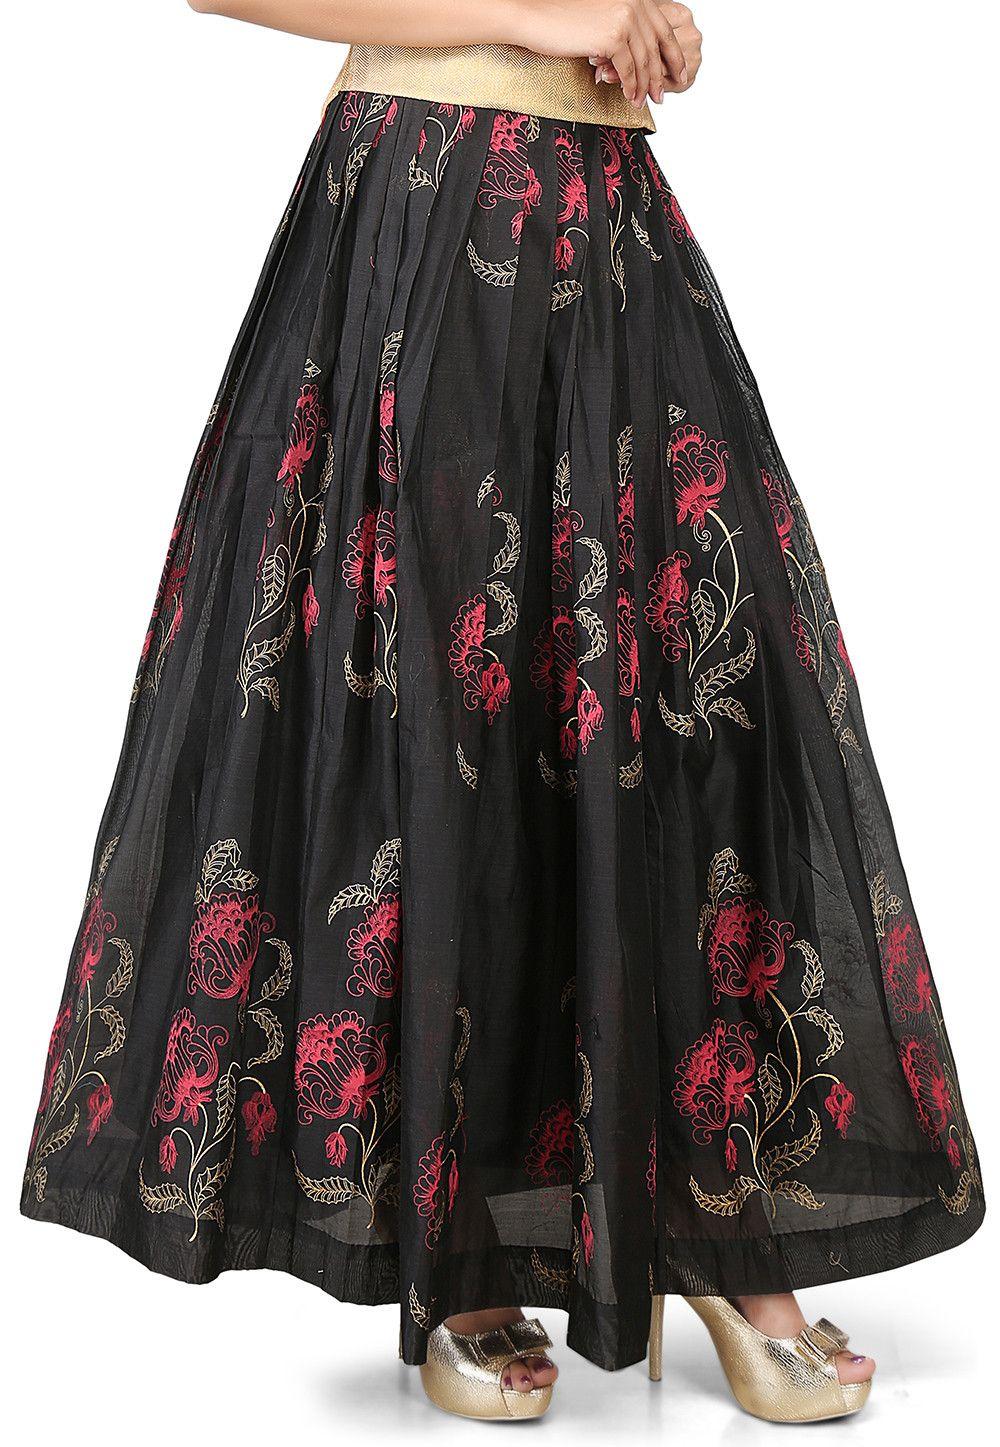 88309260f831ec Printed Chanderi Silk Long Skirt in Black   Indi ethni fusion ...